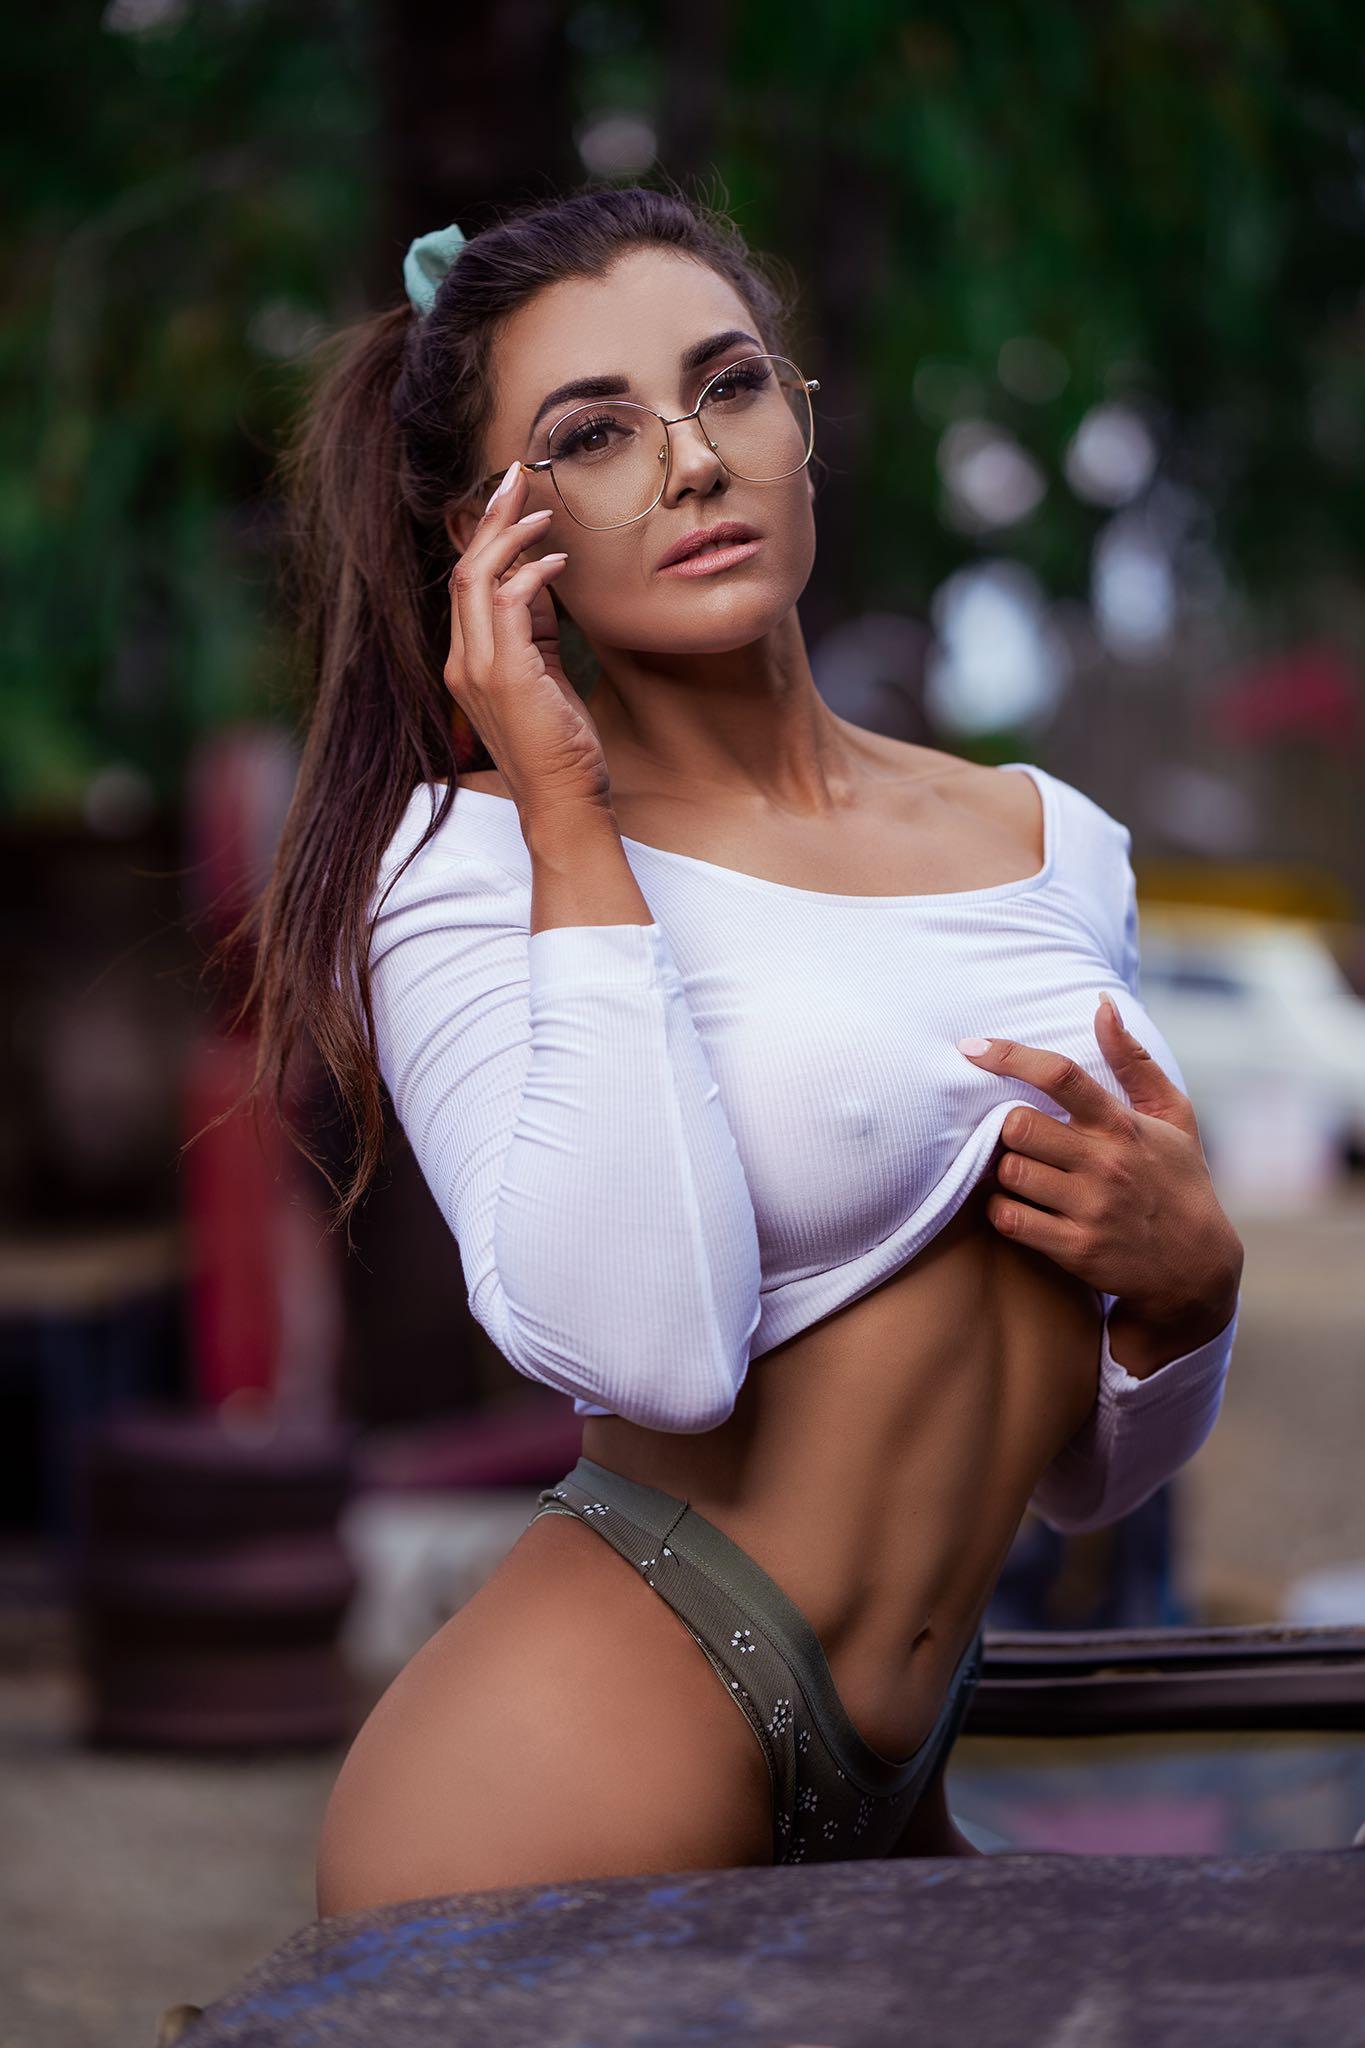 Introducing Yvette Ferreira as this week's LW Babe